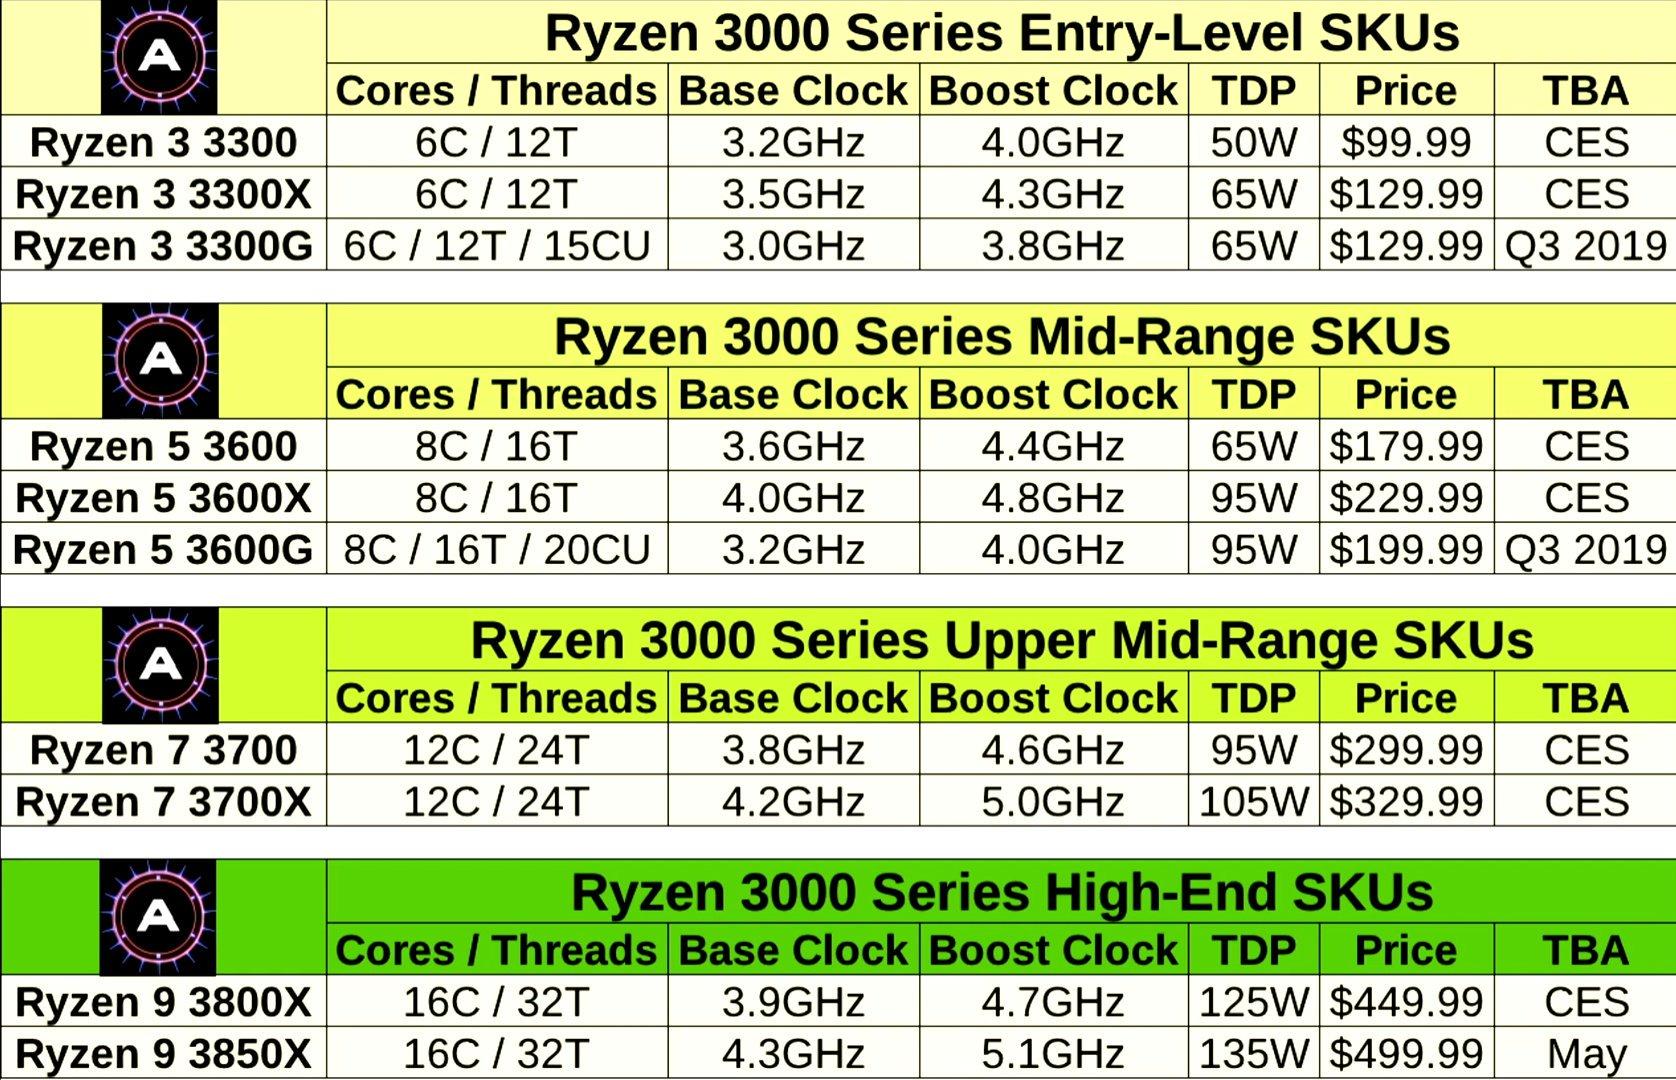 Entry Level Amd Ryzen 3000 Matisse Processor S Scores On Geekbench Will Make Intel Nervous Notebookcheck Net News